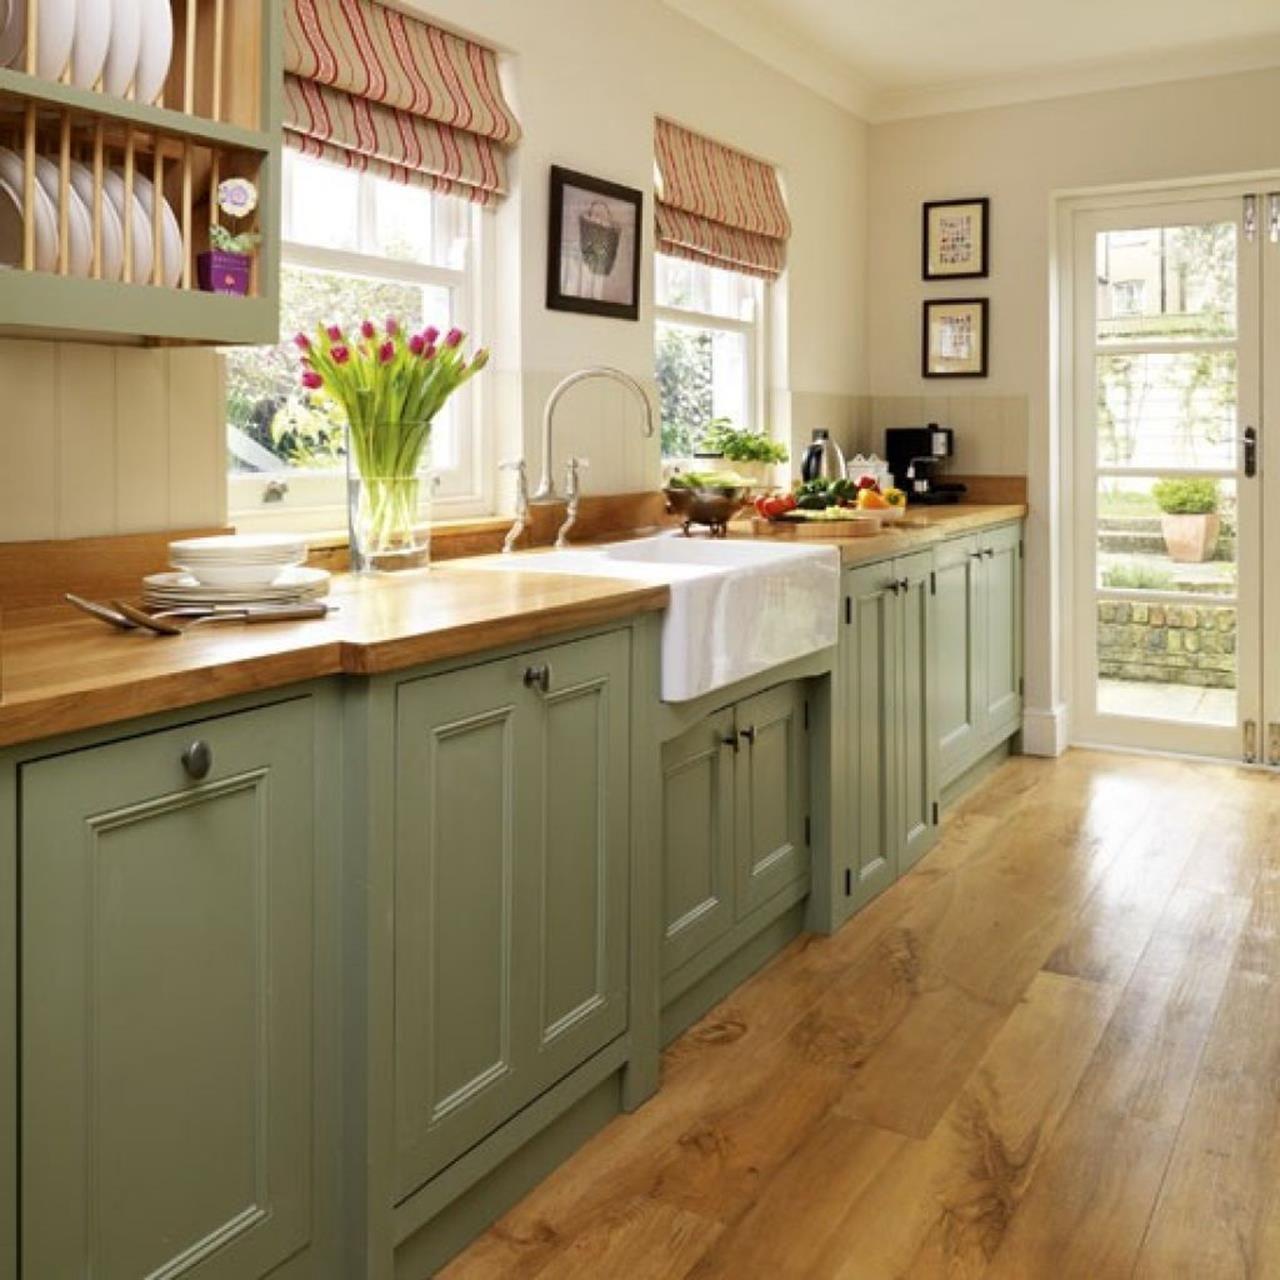 40 Small Kitchen Design Ideas: 40+ Stunning Country Cottage Kitchen Decorating Ideas